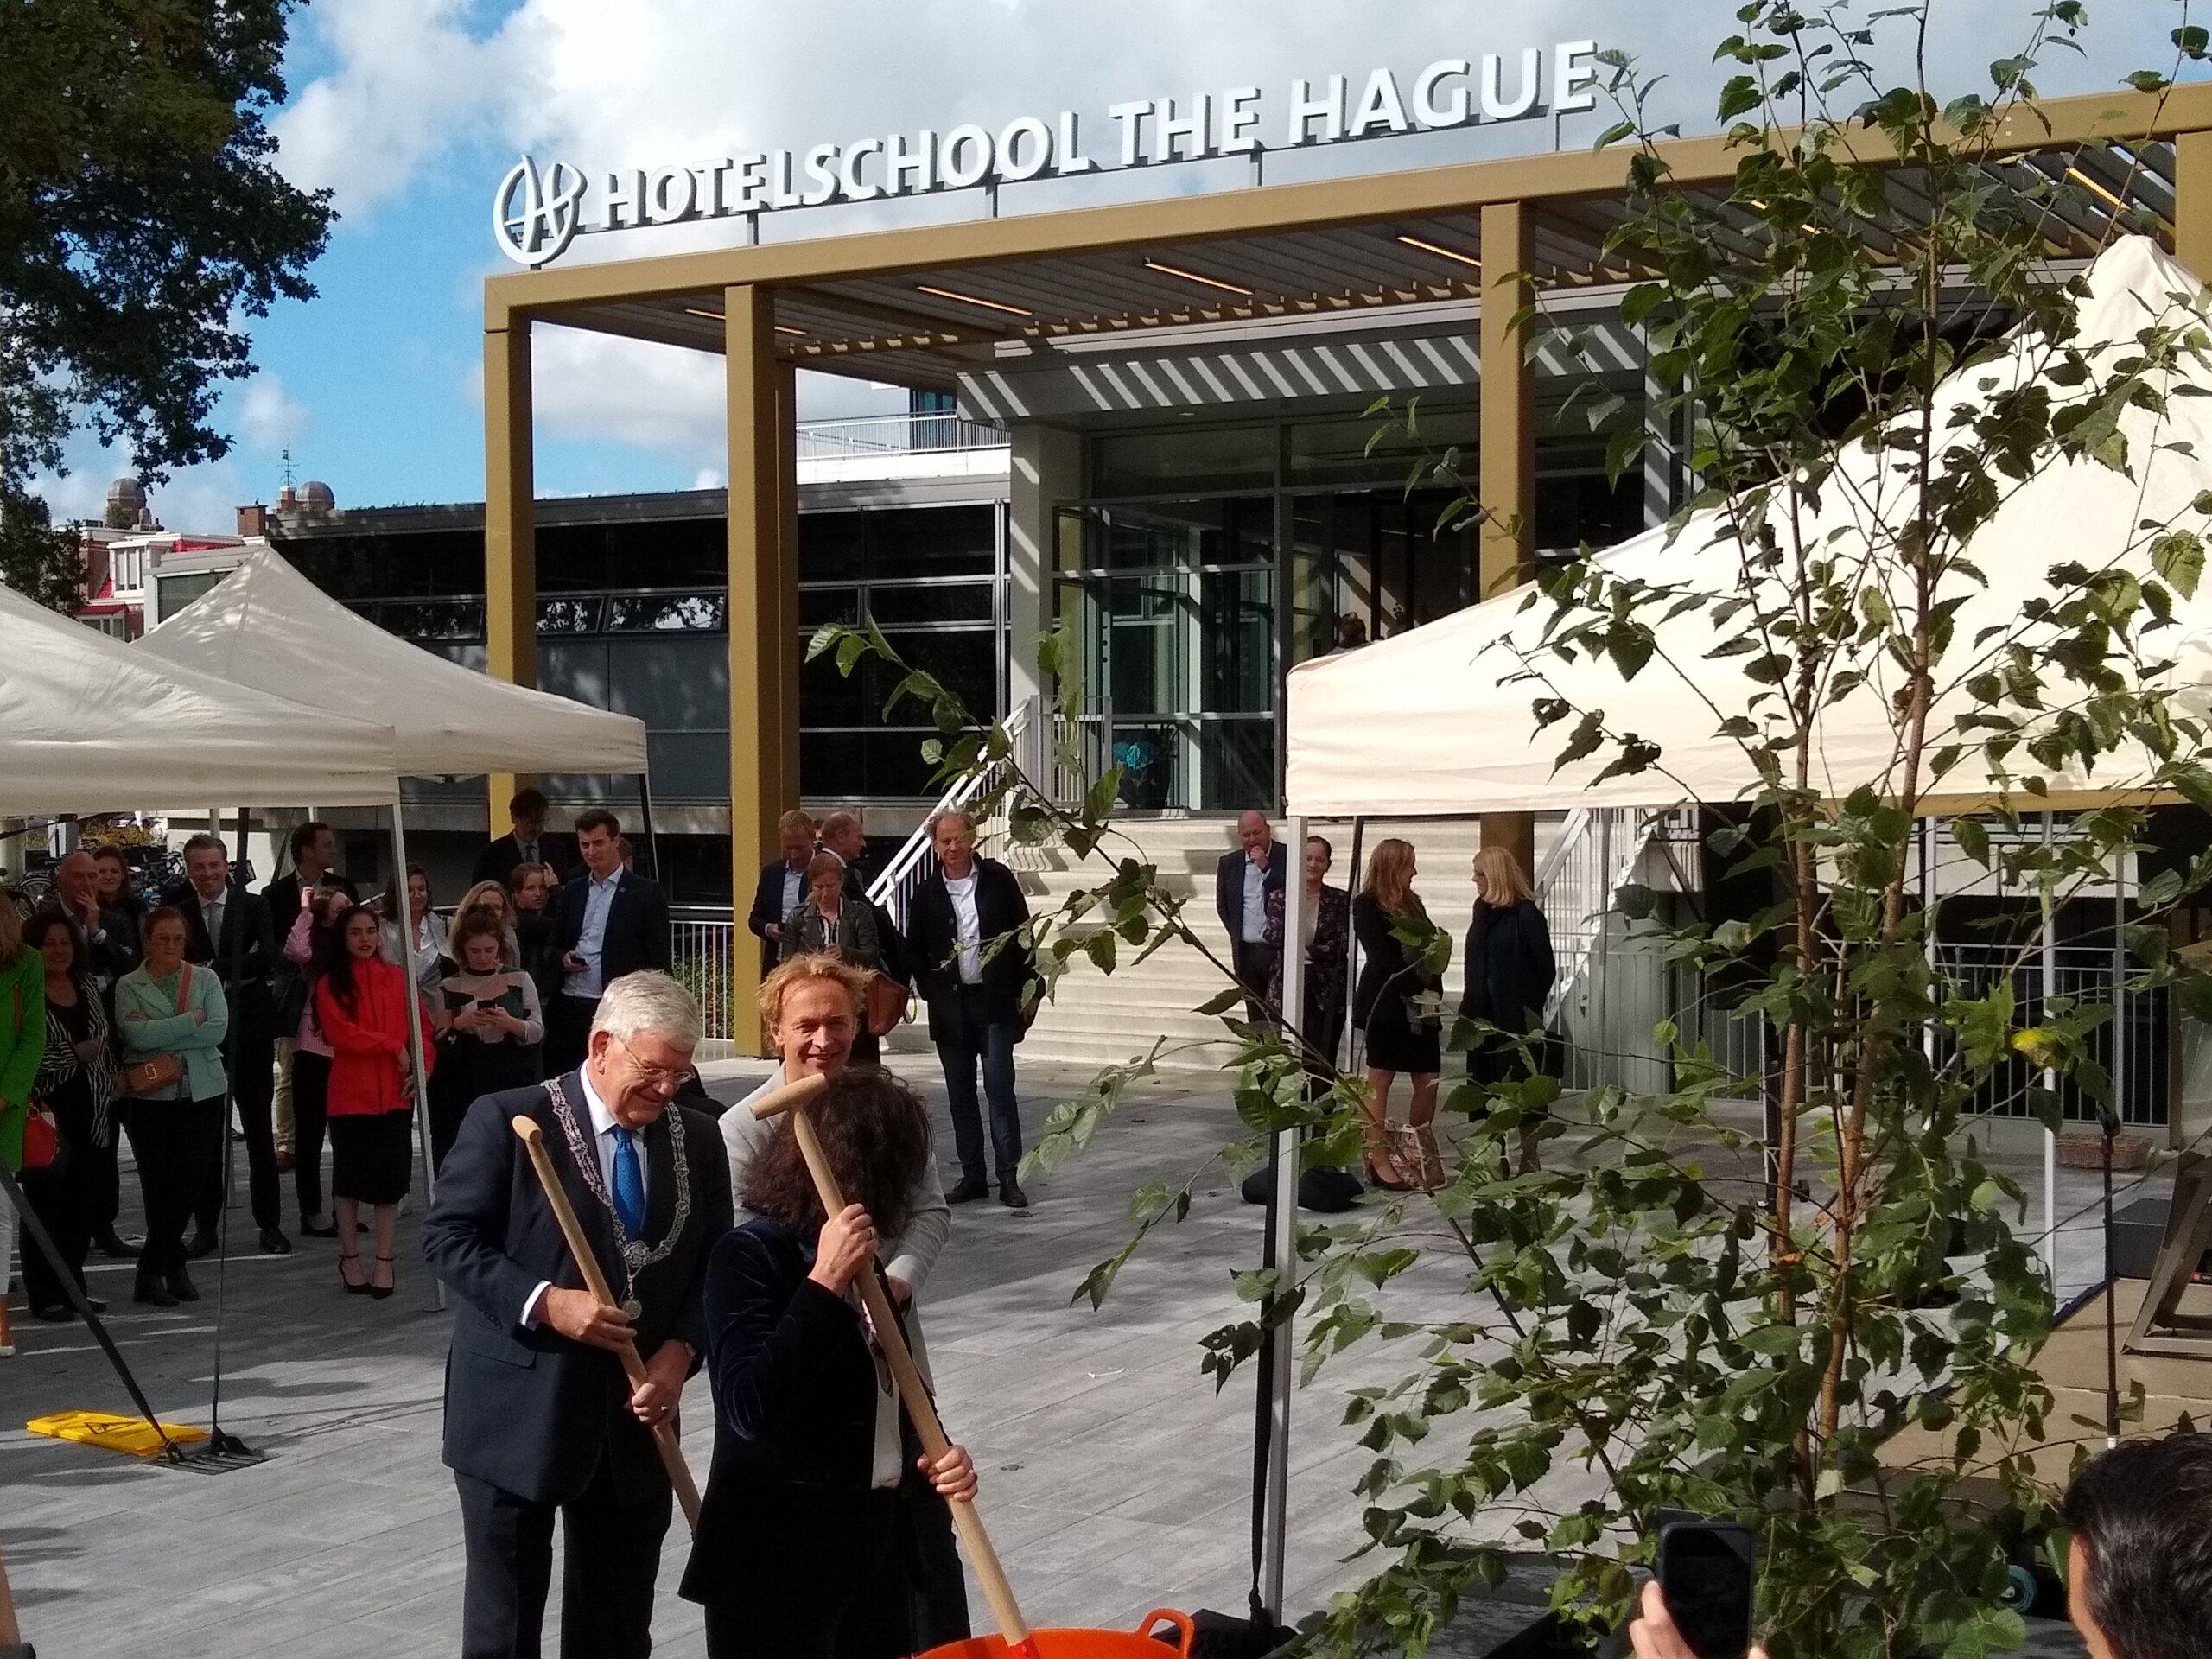 Opening En Film Hotelschool The Hague